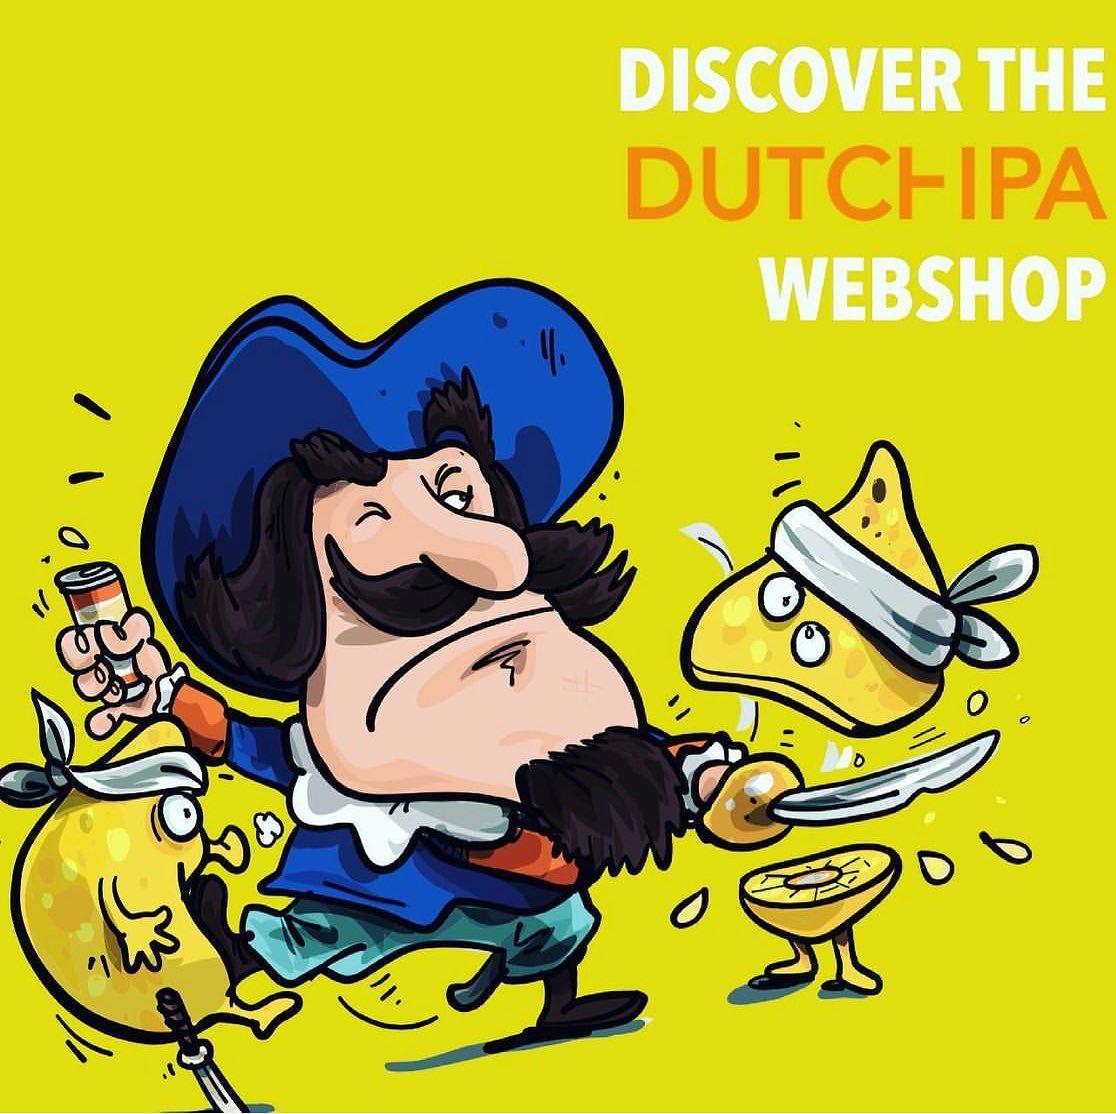 <p>Dutch IPA, webshop, 10 juli 2021</p>